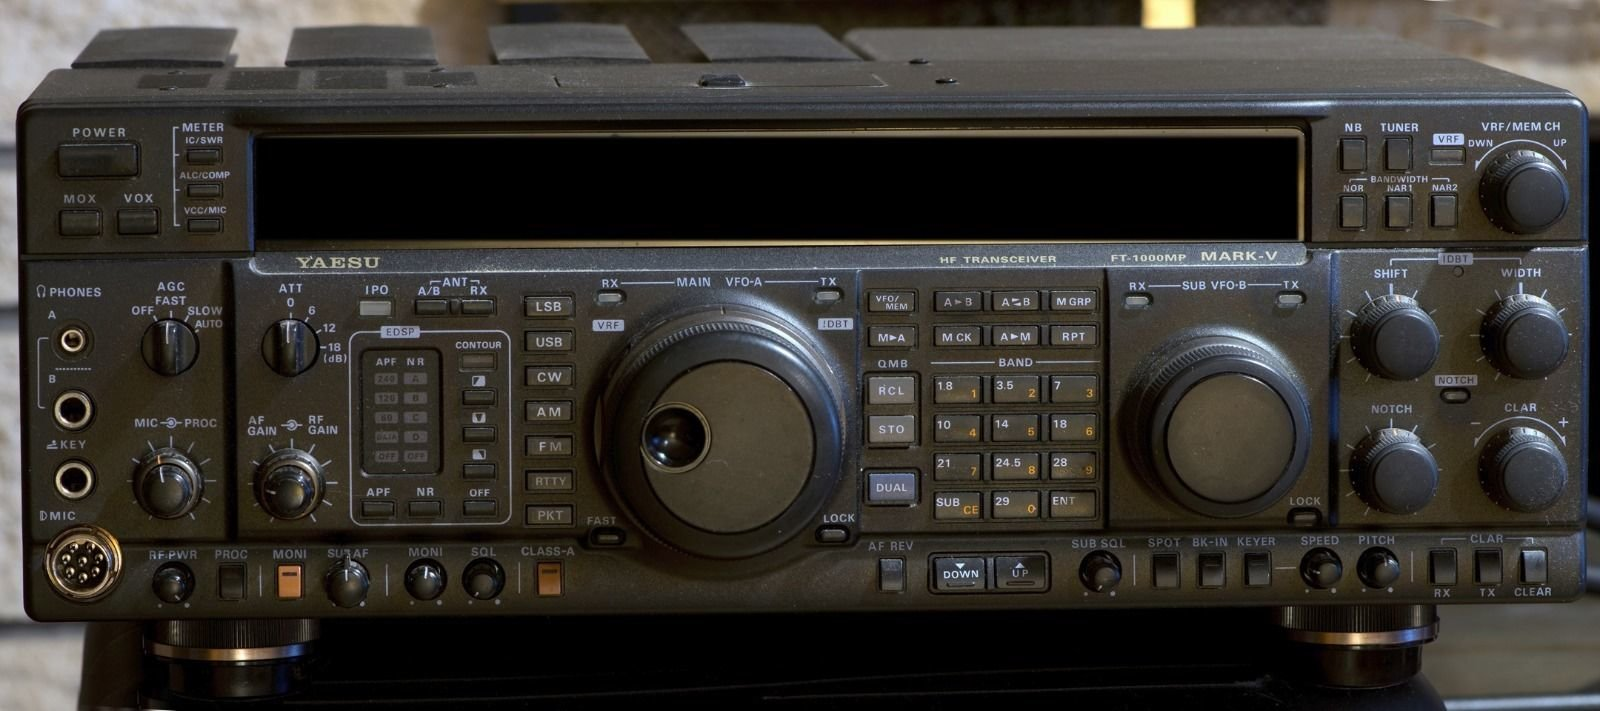 Fm transmitter piss off neighbor